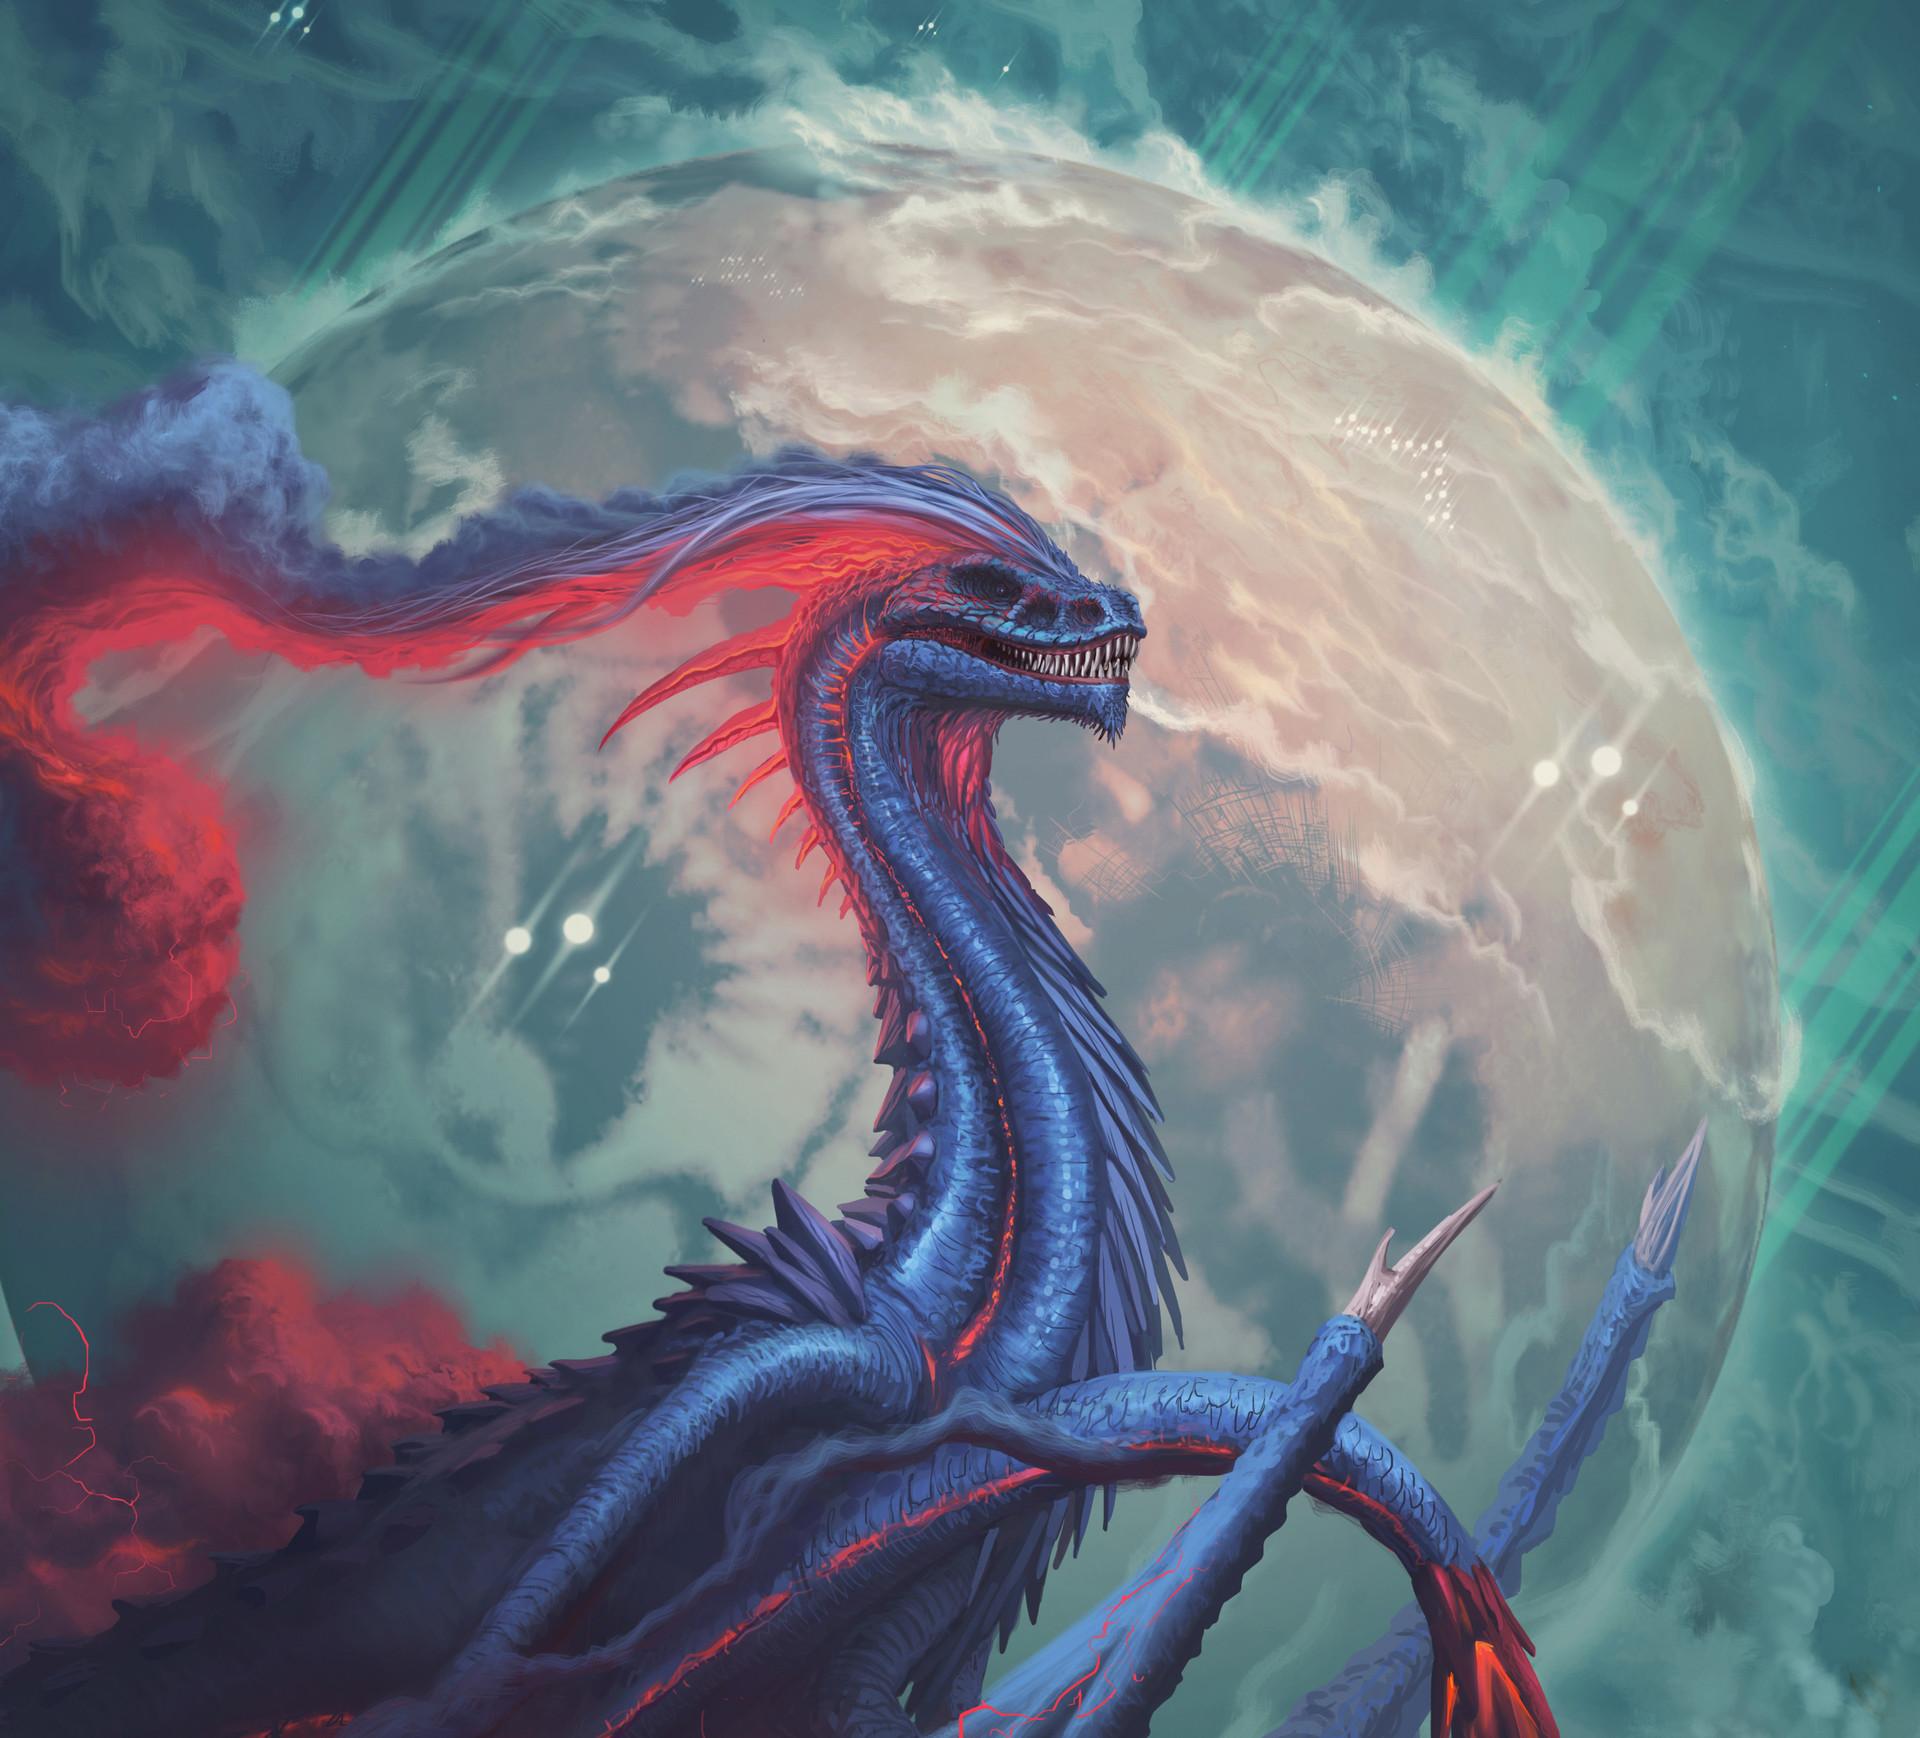 Francisco badilla floyd dragon sketch bueno 11